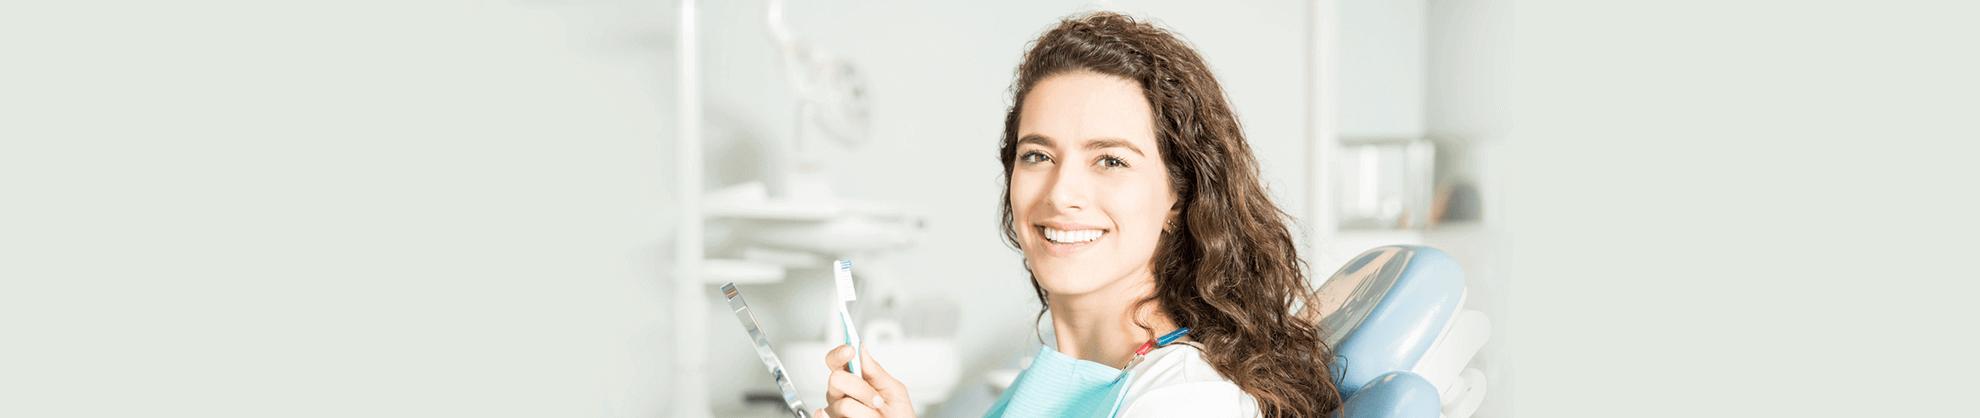 regular dental checkups background